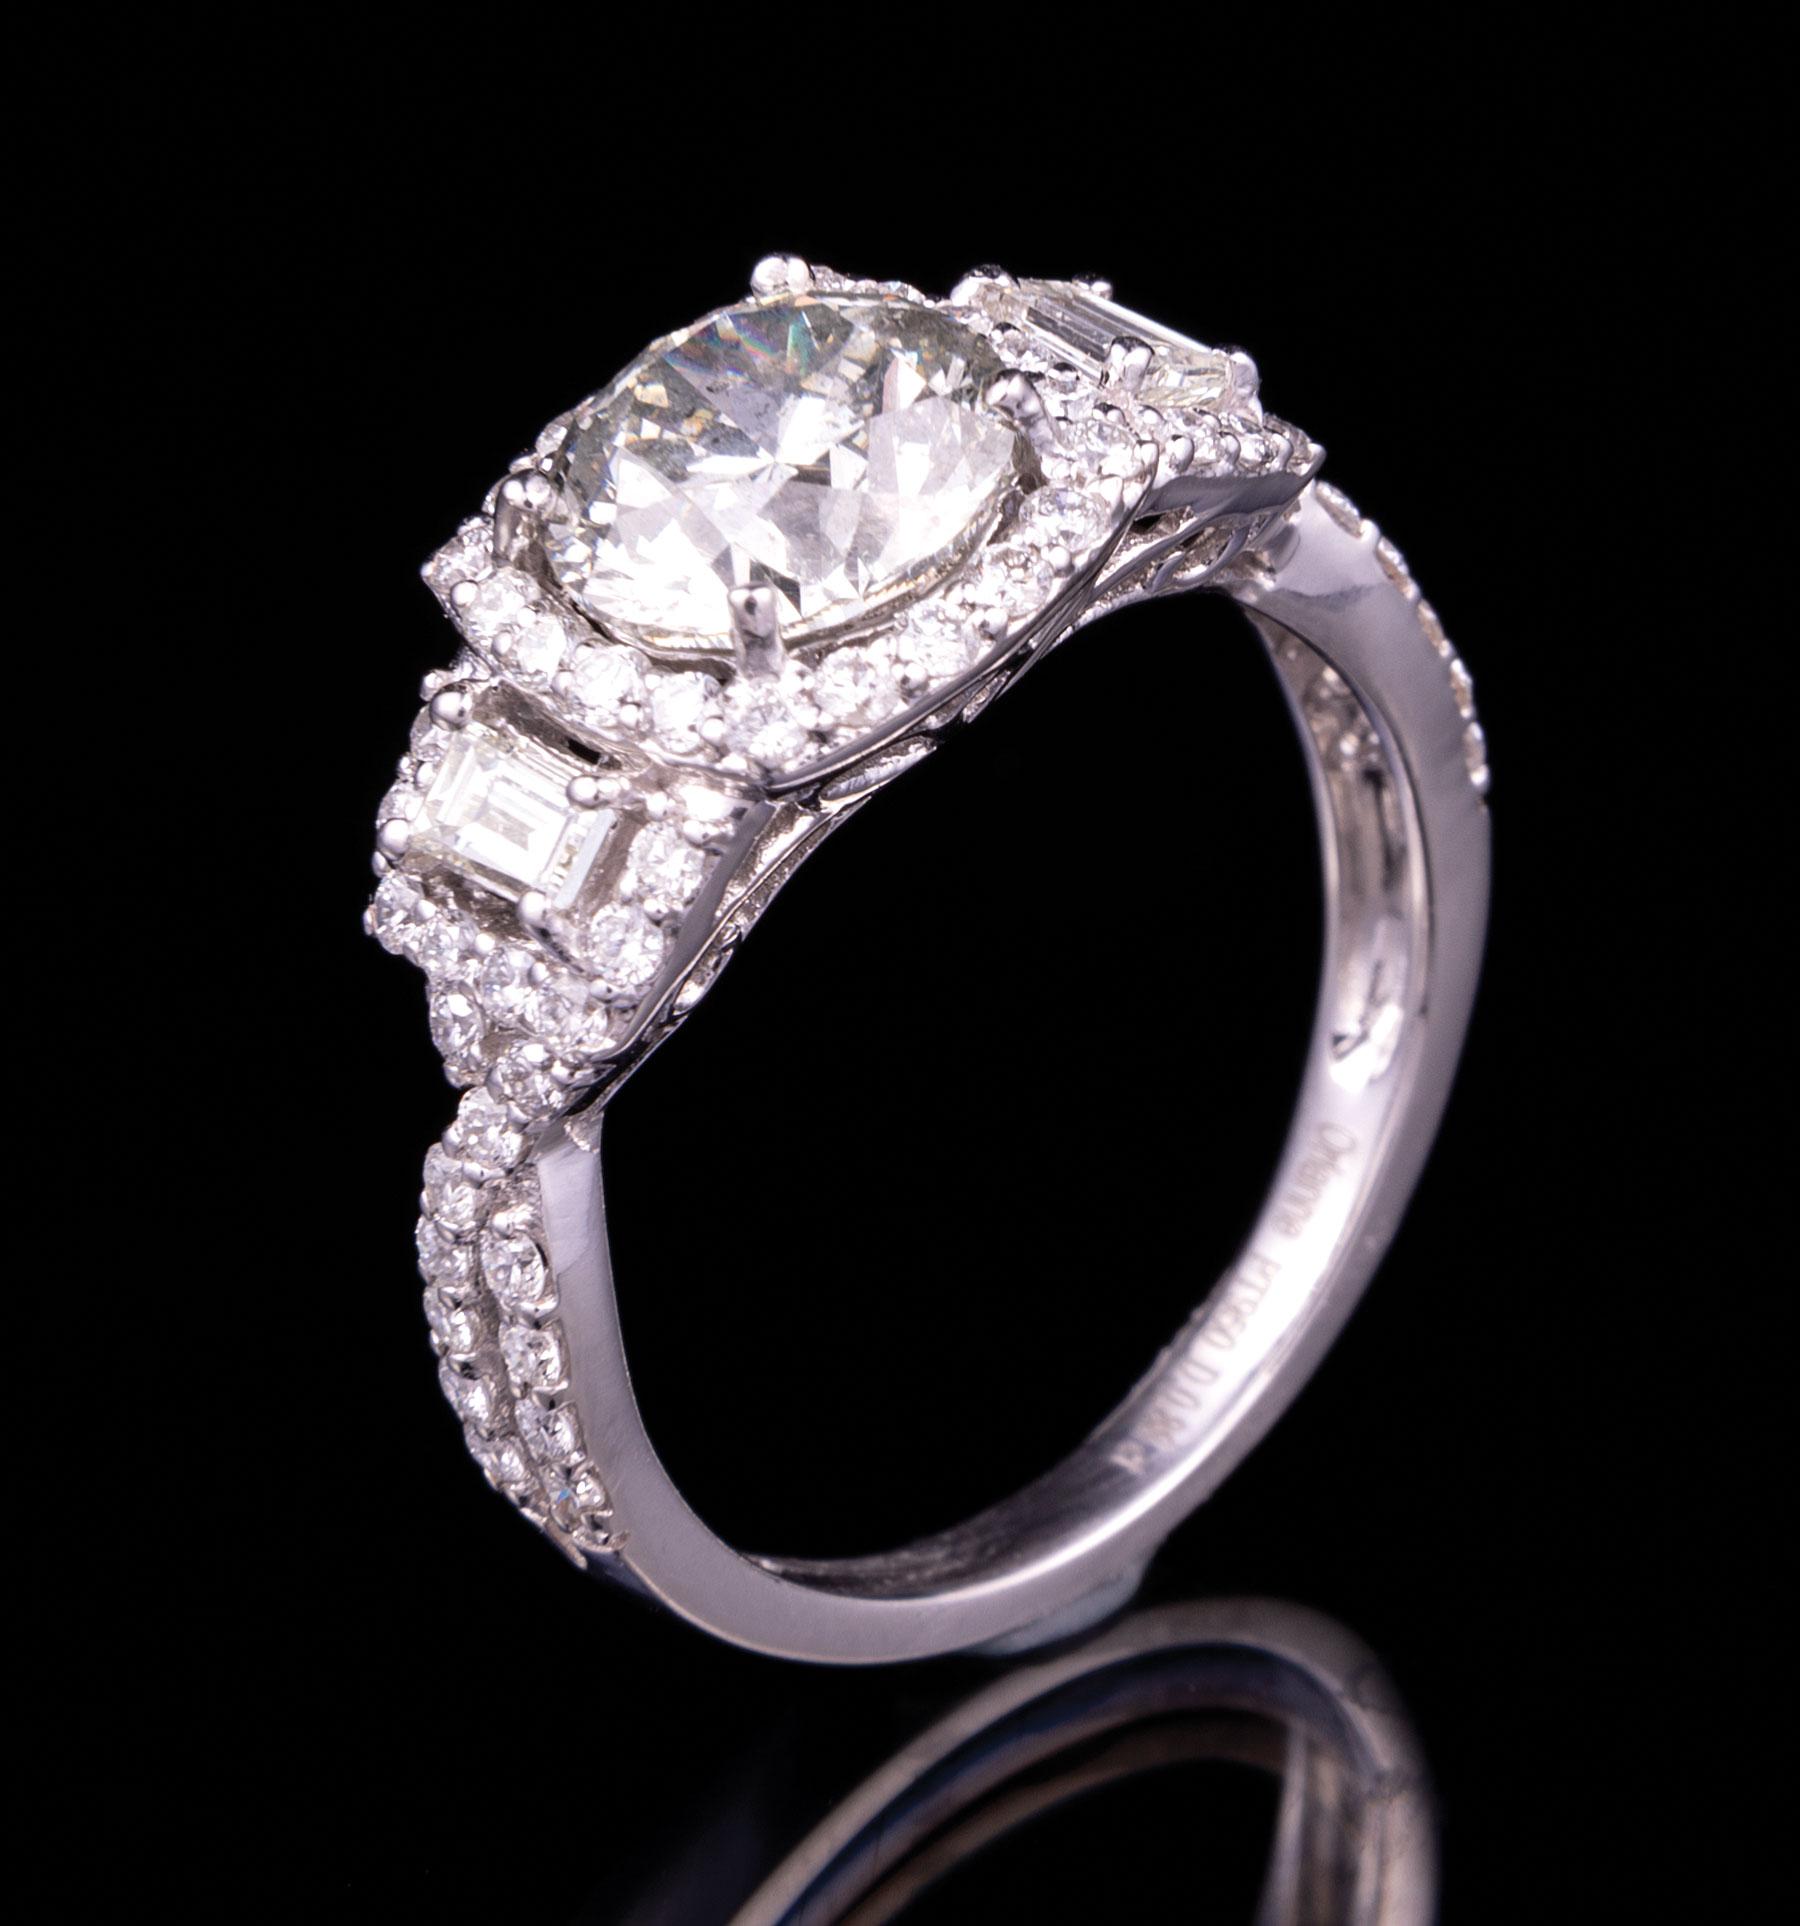 Lot 601 - Platinum and Diamond Ring , prong set round brilliant cut diamond, 7.80 - 7.80 x 5.00 mm, exact